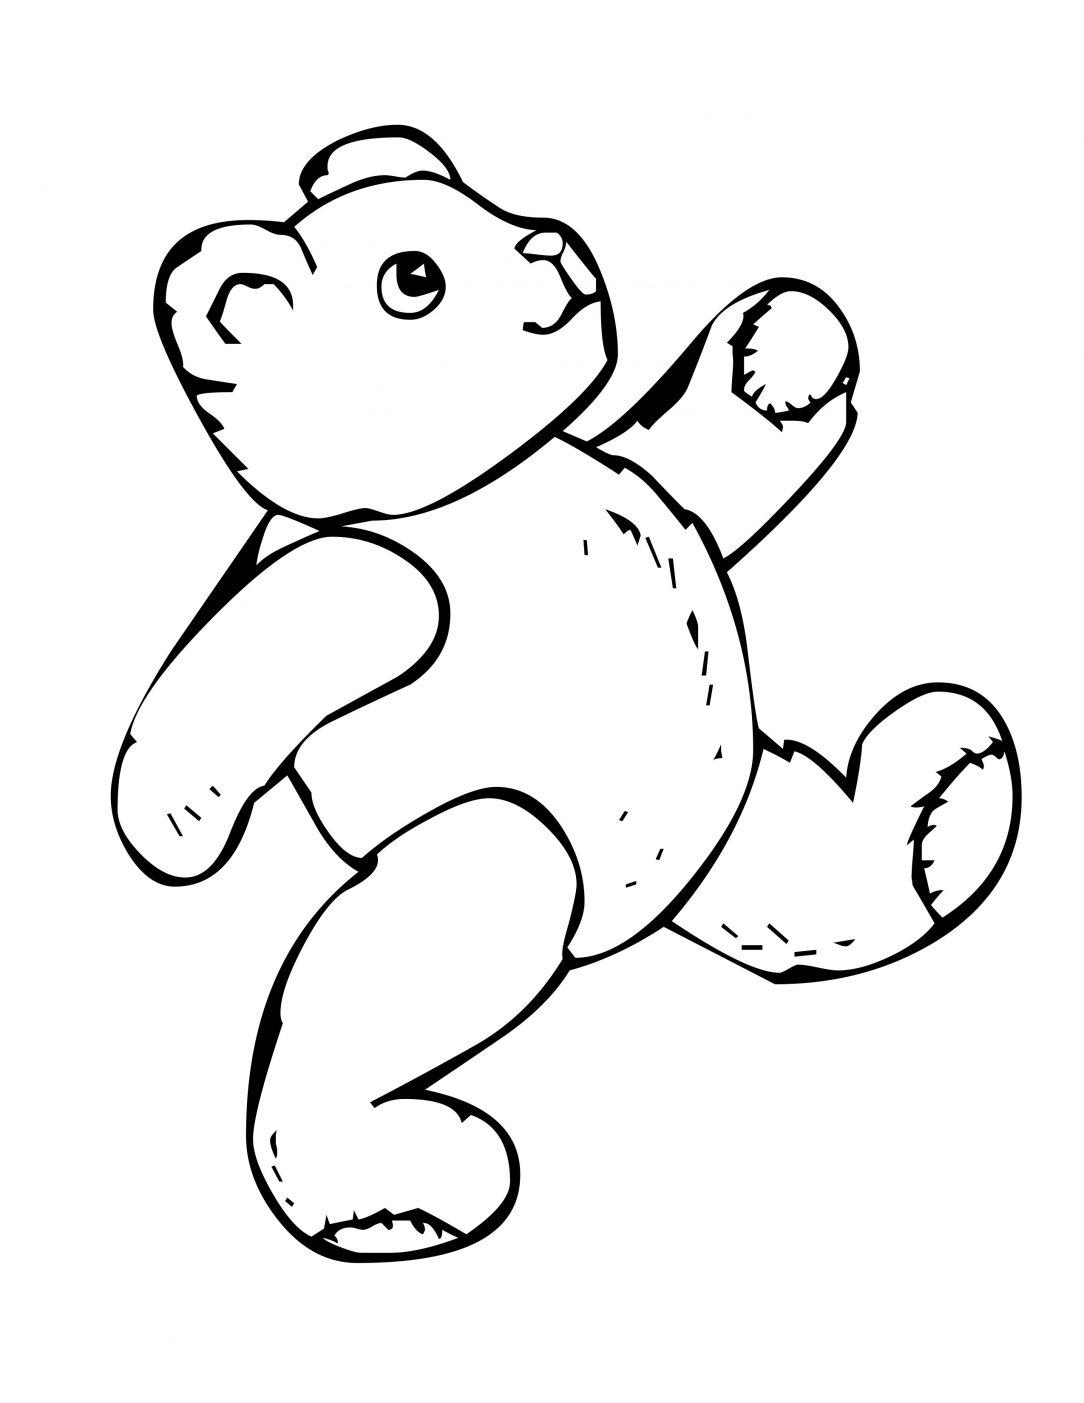 1084x1403 Bear Skull Drawings Cute Right To Arms Black Cartoon I Fertility